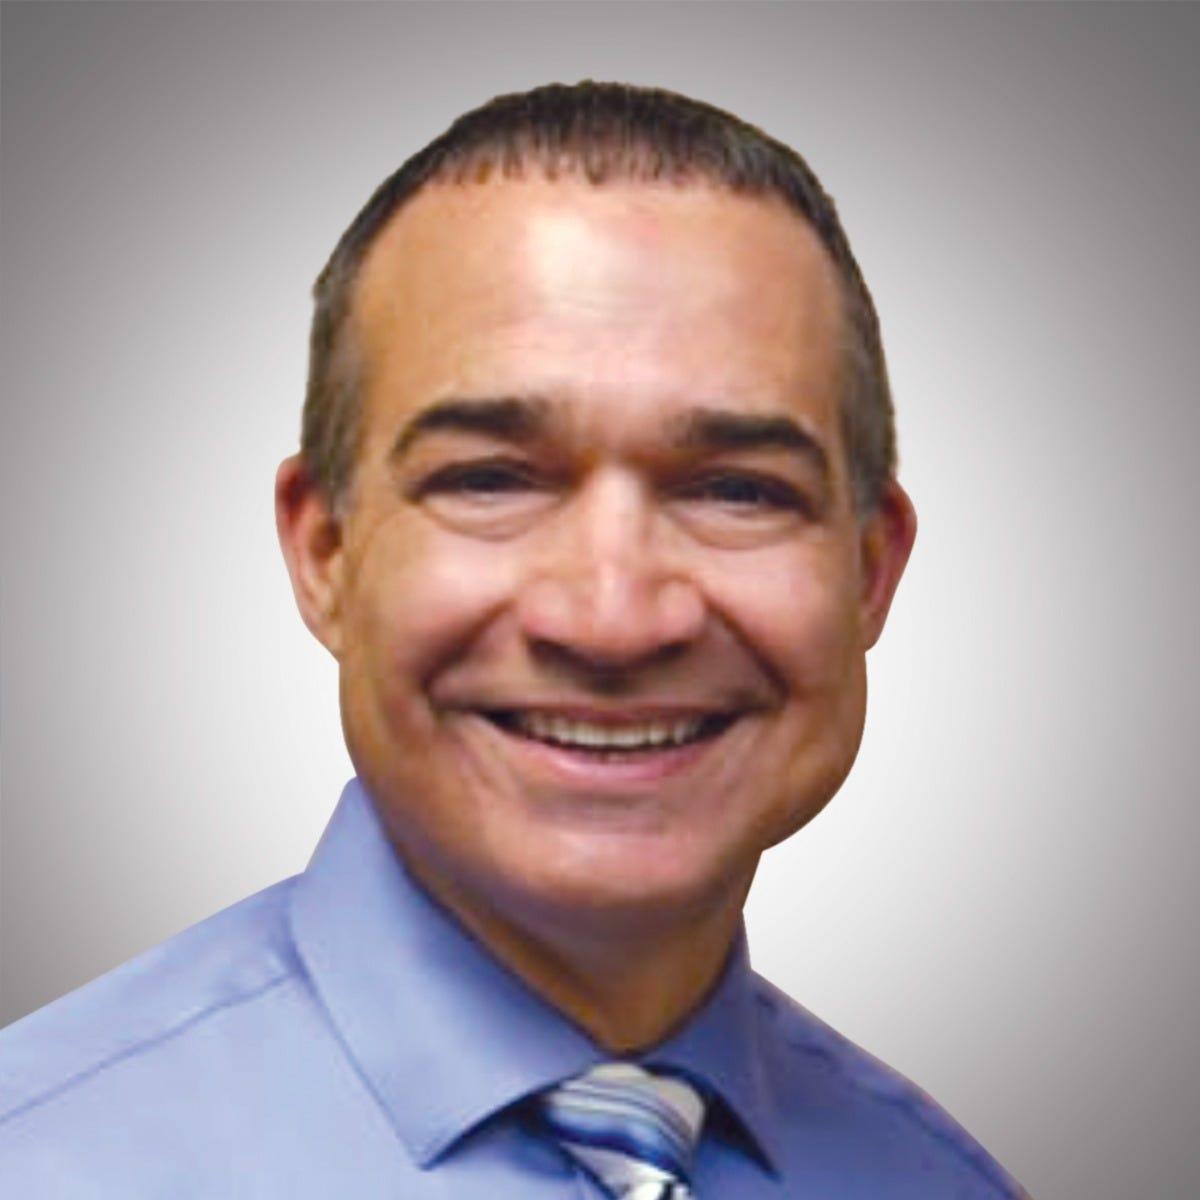 Dental Education Instructor - Steve Biagini, DDS